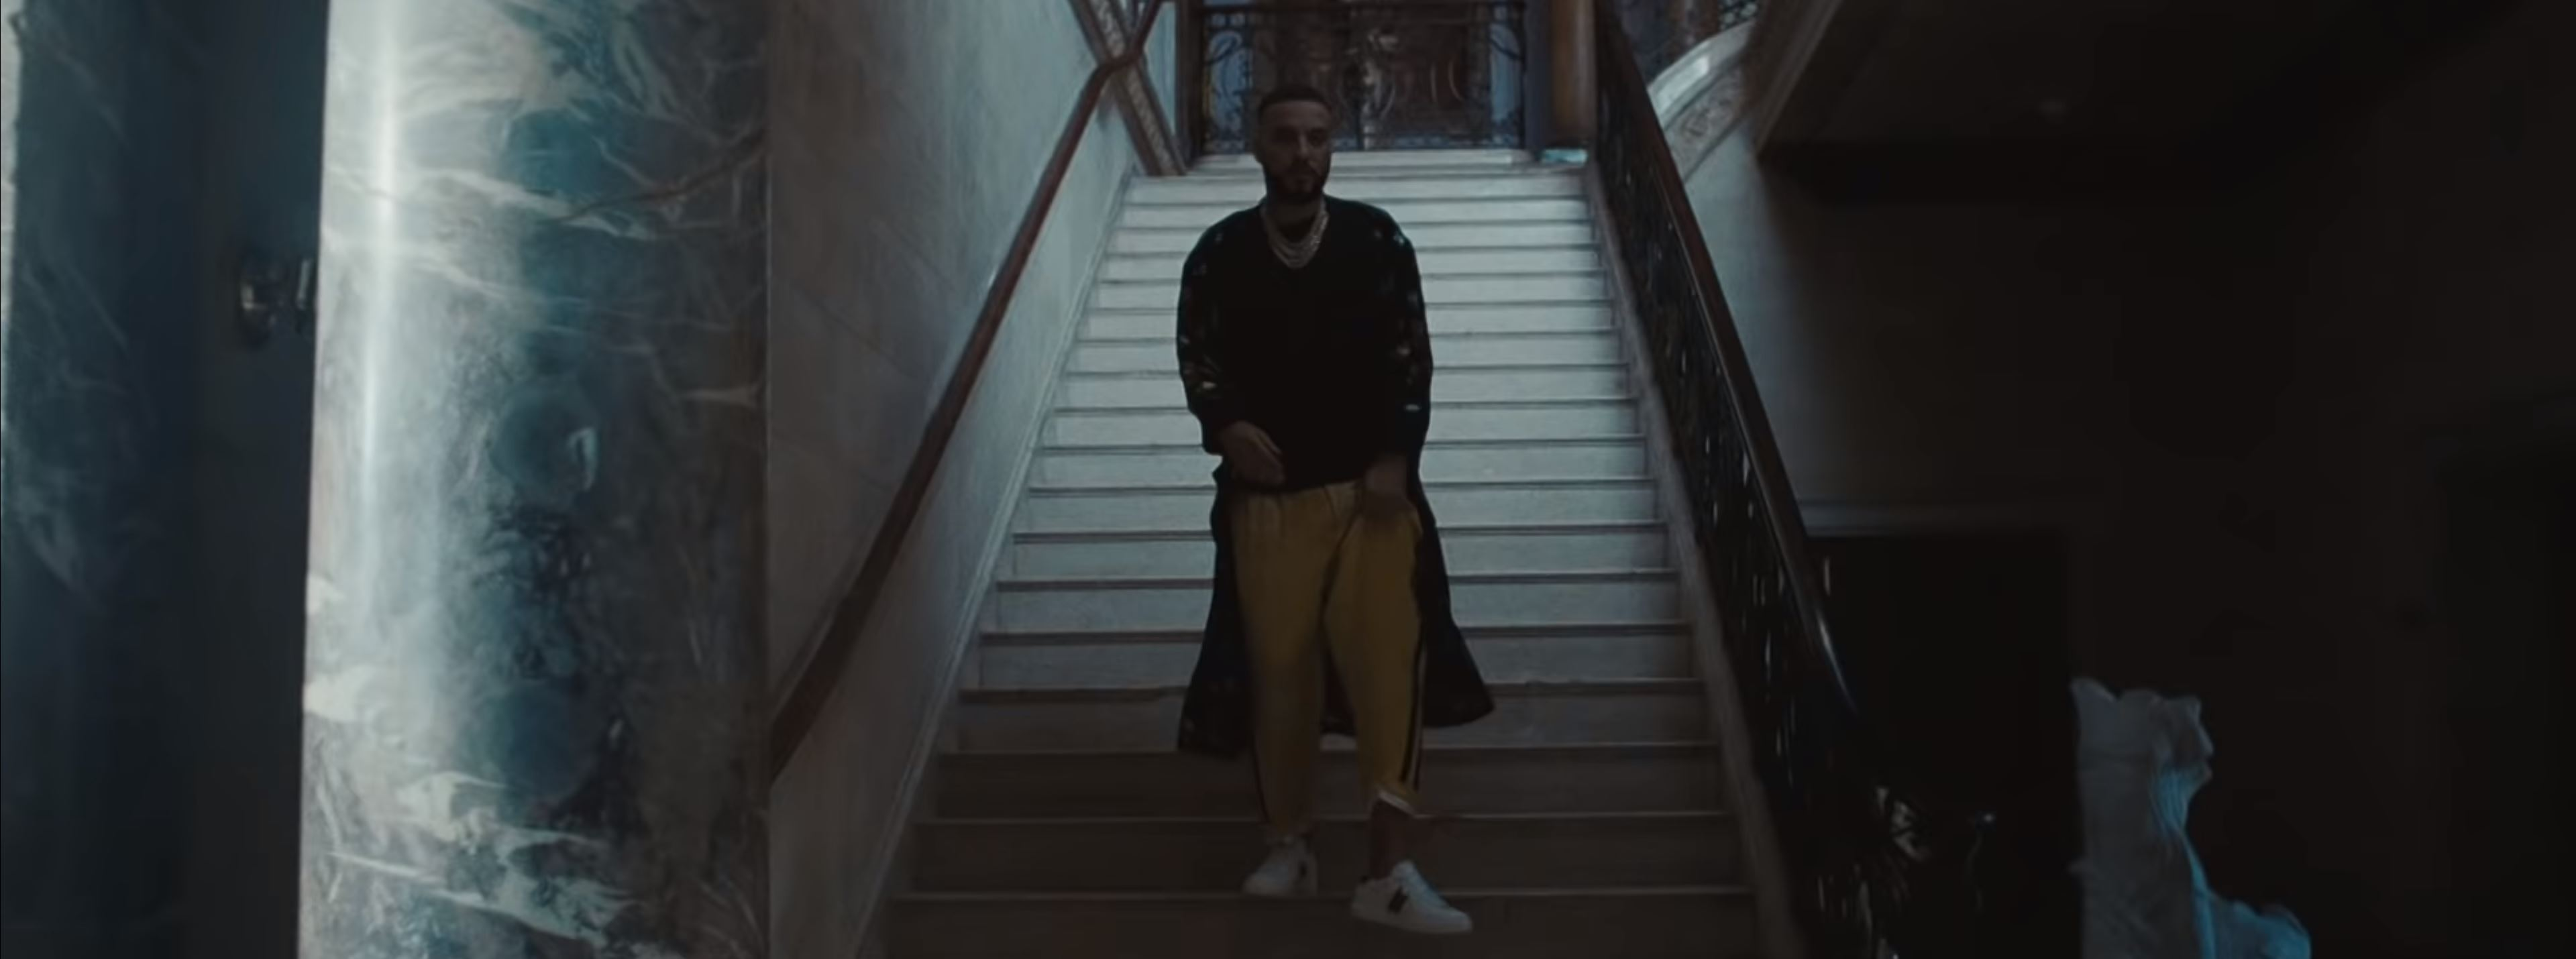 008 No Stylist by Drake